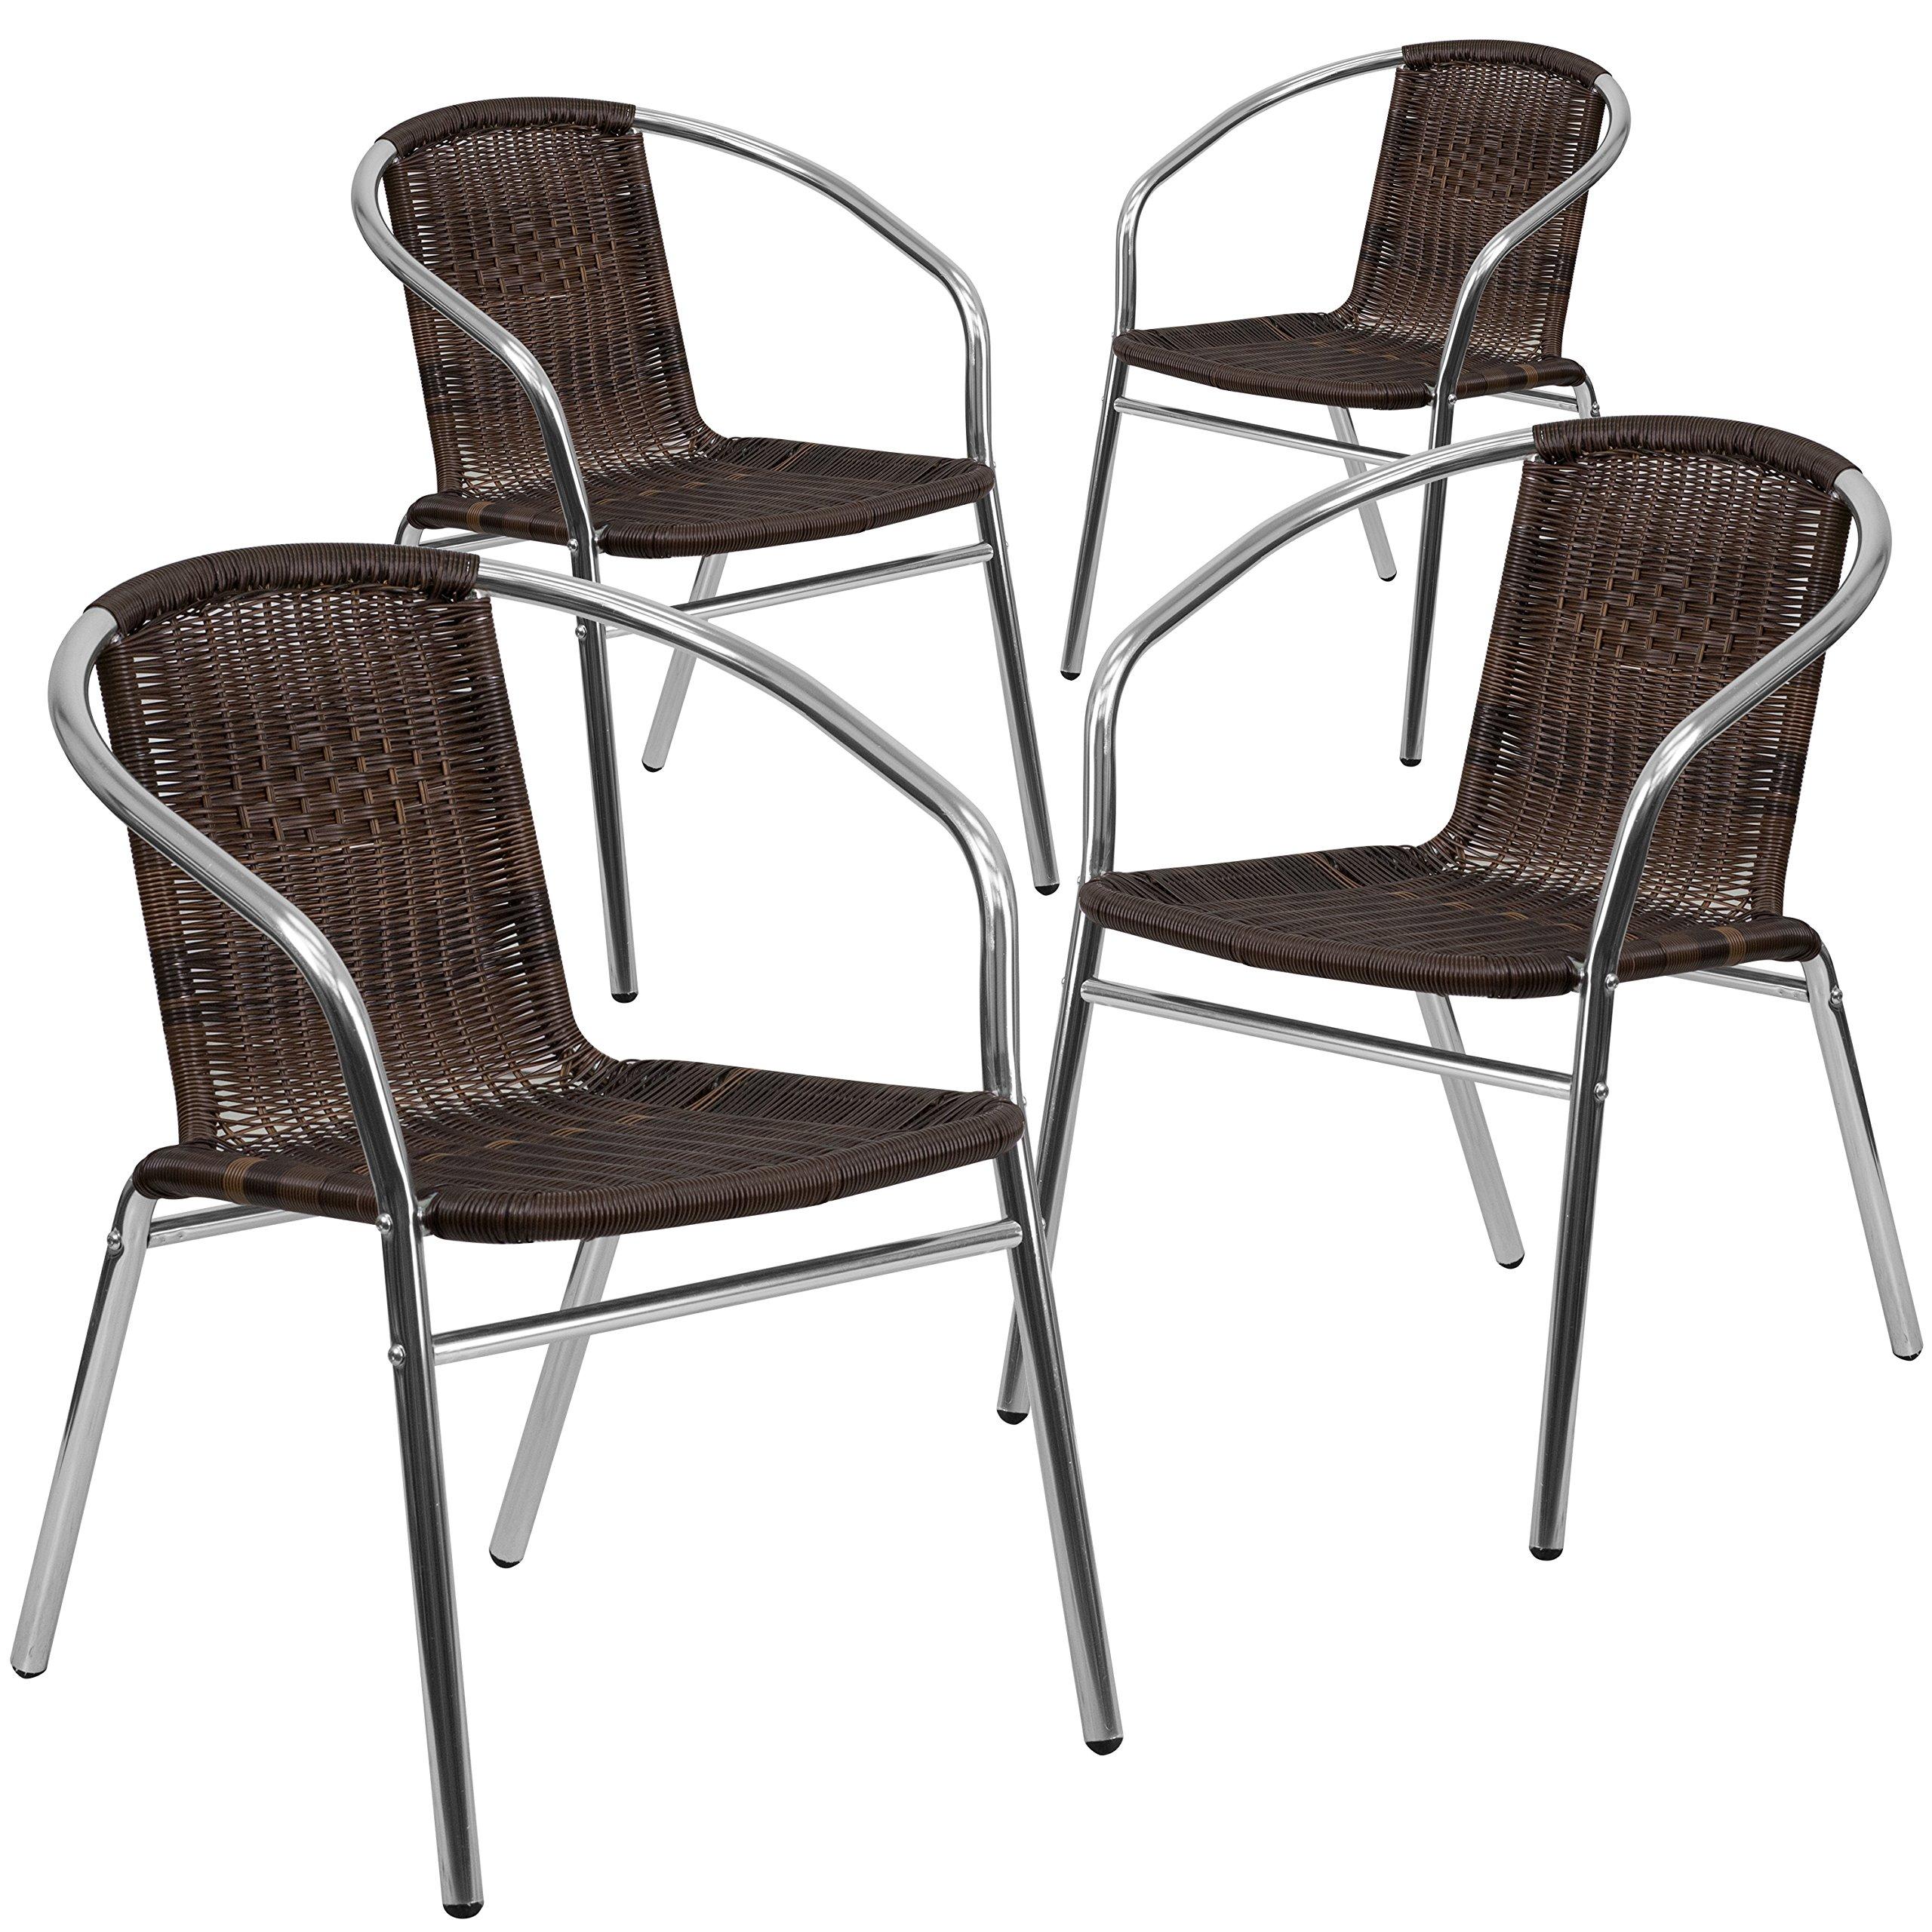 Flash Furniture 4 Pk. Commercial Aluminum and Dark Brown Rattan Indoor-Outdoor Restaurant Stack Chair